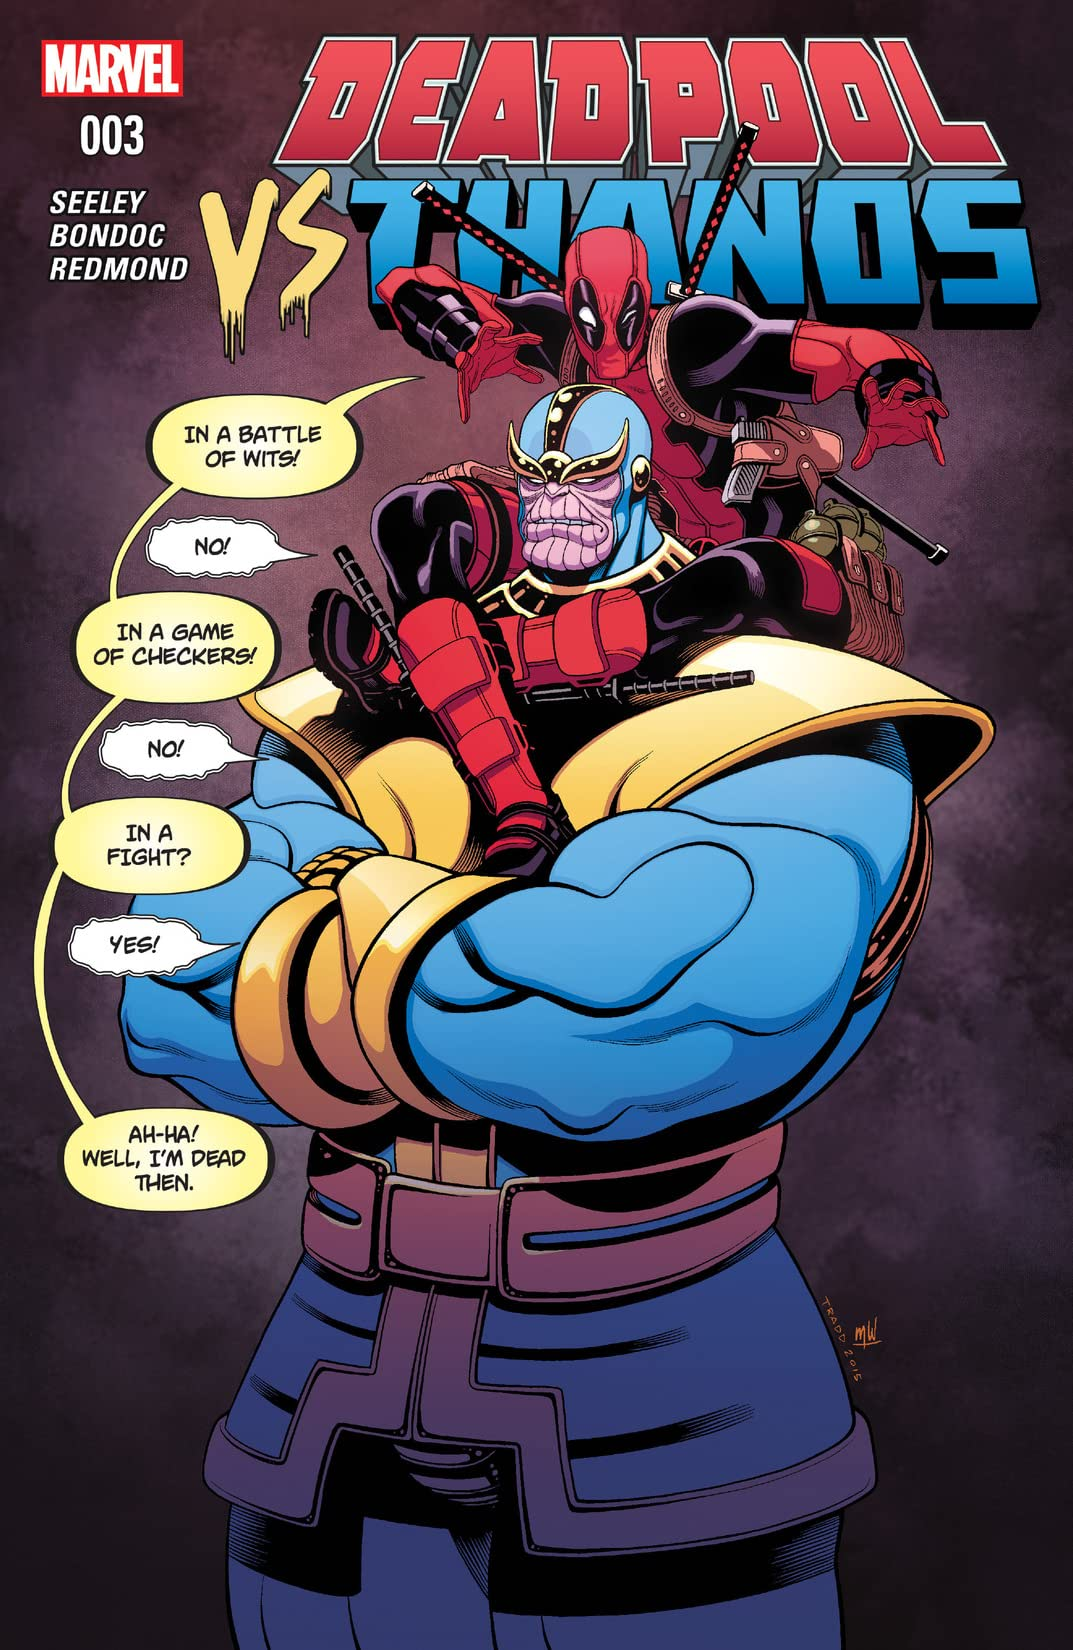 Deadpool vs  Thanos (2015) #3 (of 4) - Comics by comiXology: Web UK